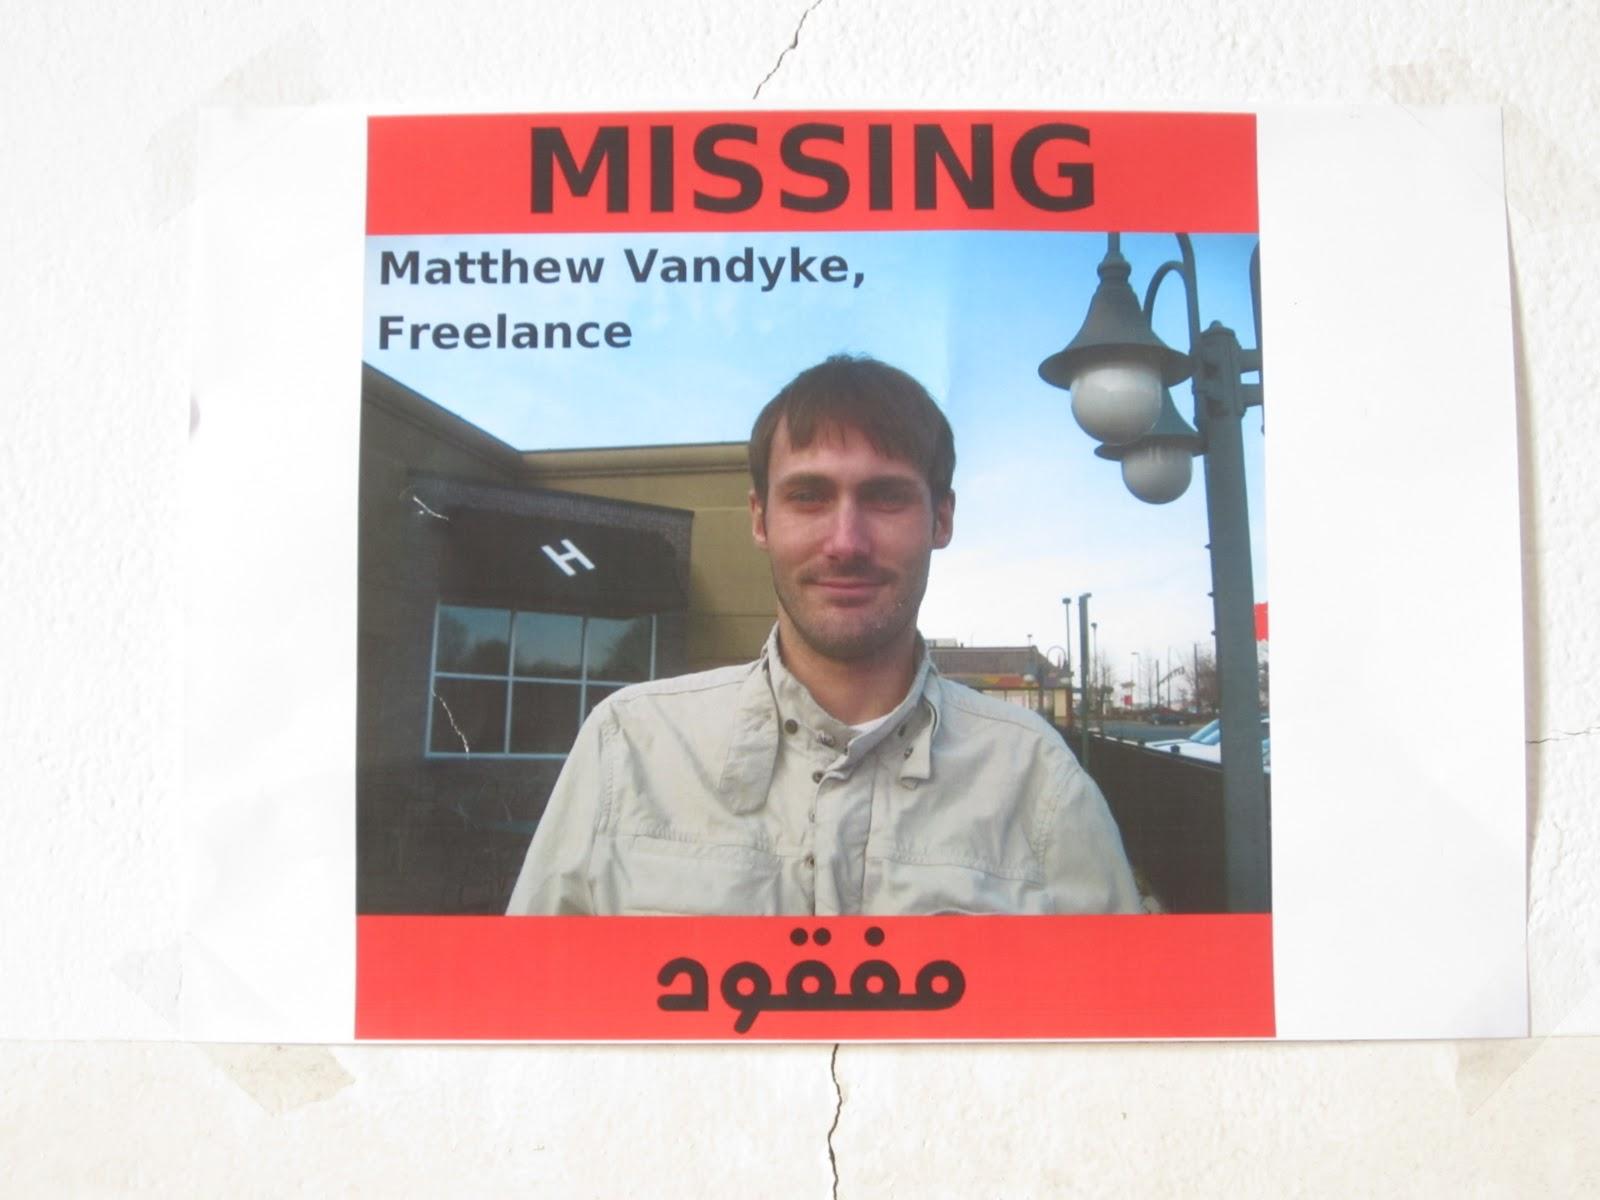 A missing person poster for Matthew Van Dyke, Benghazi